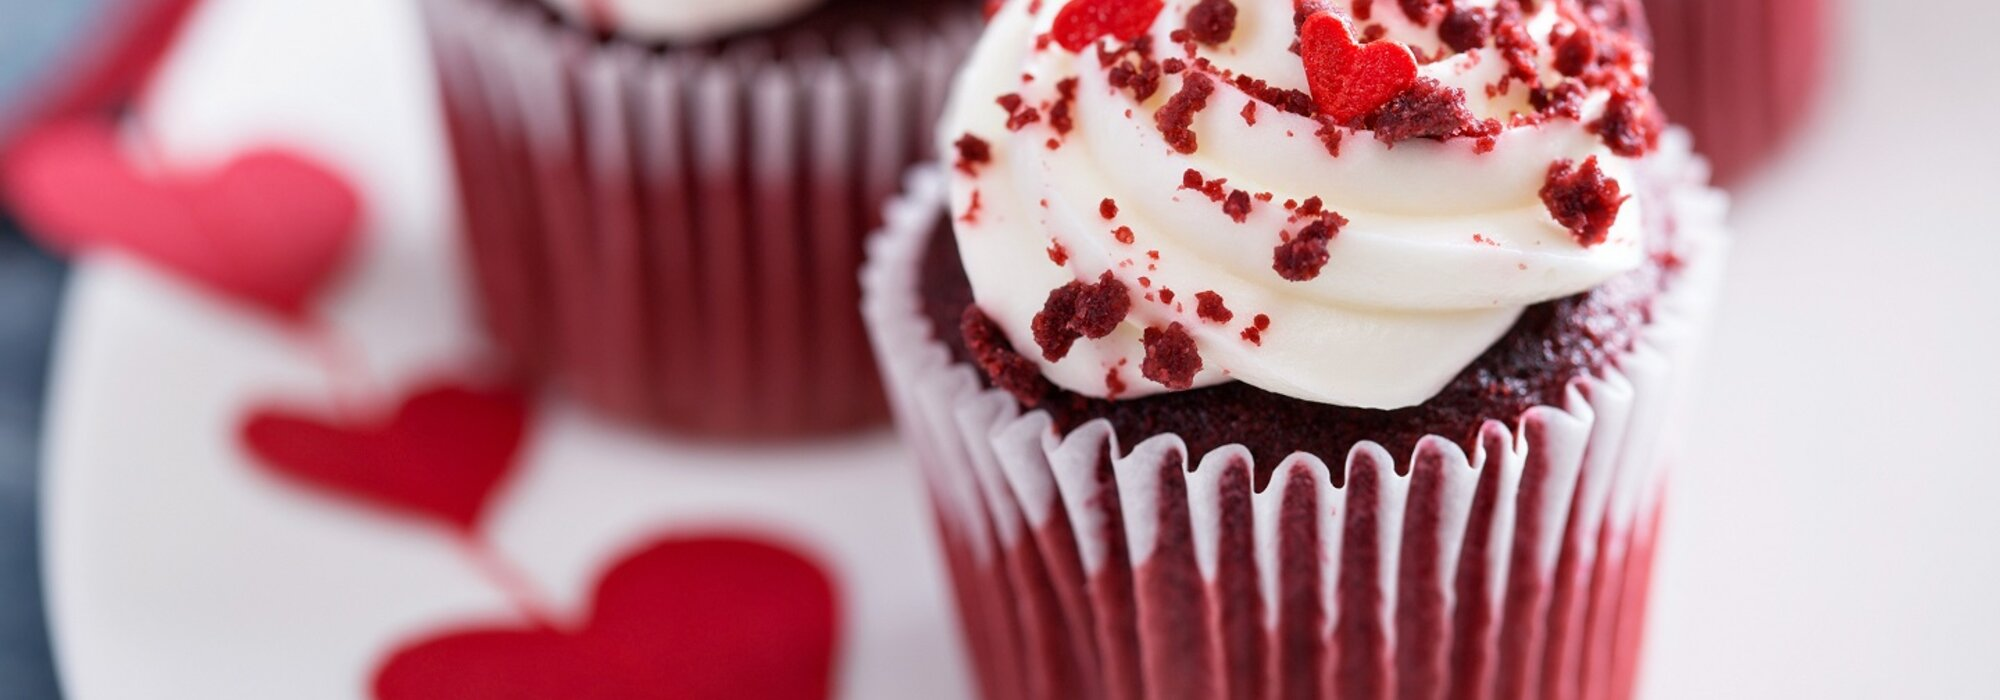 Koolhydraatarme Red Velvet cupcakes